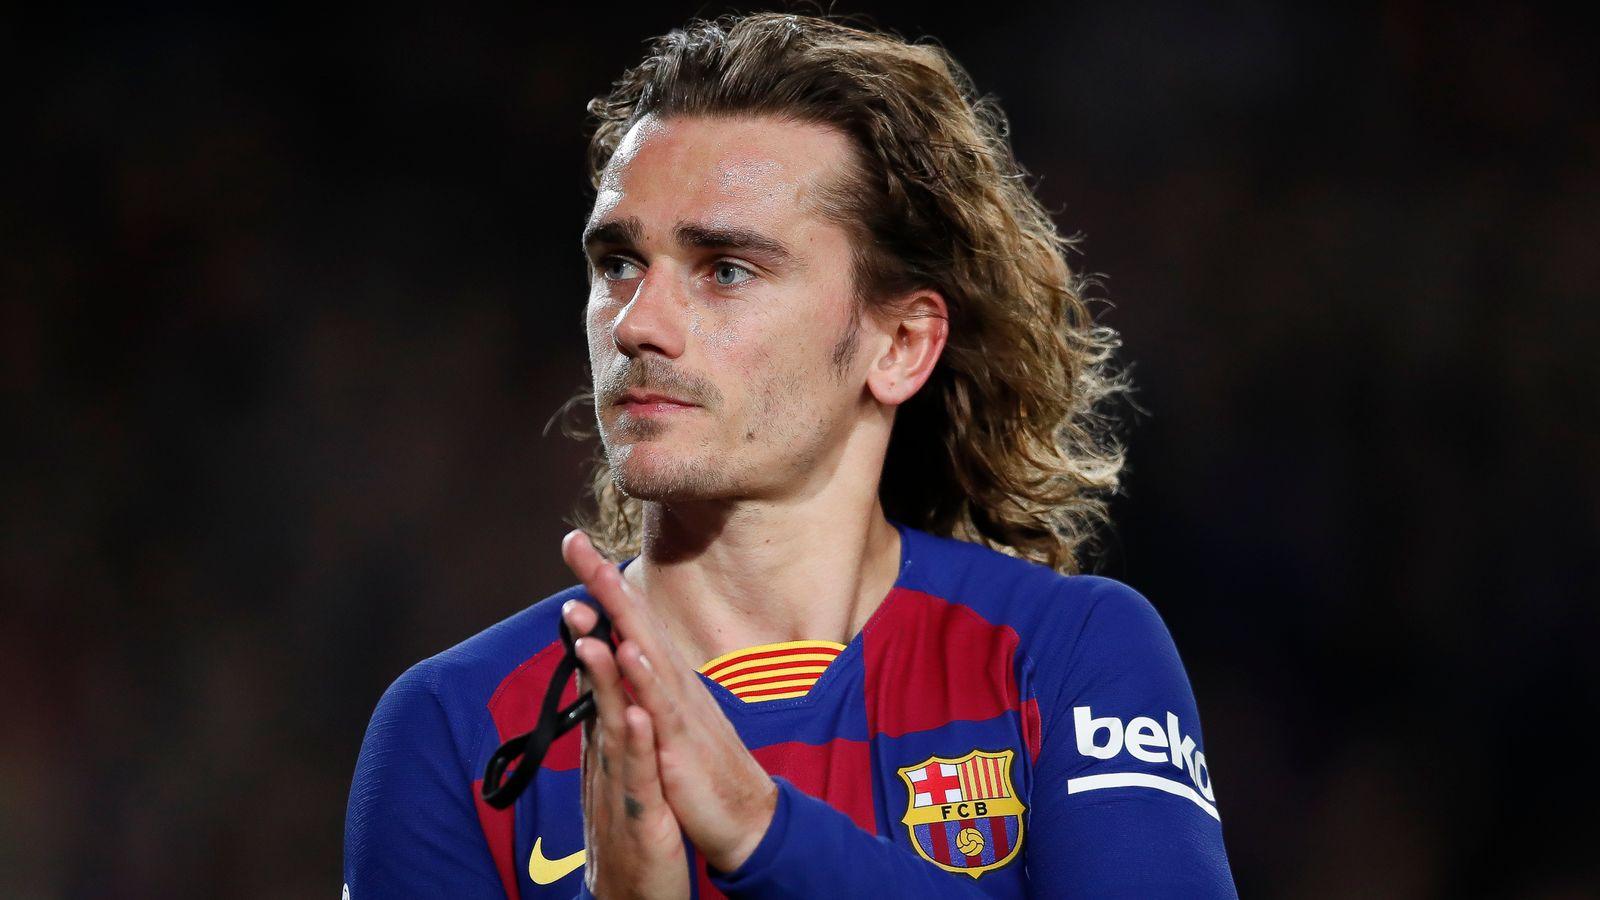 Antoine Griezmann: Barcelona trophies first, then MLS move